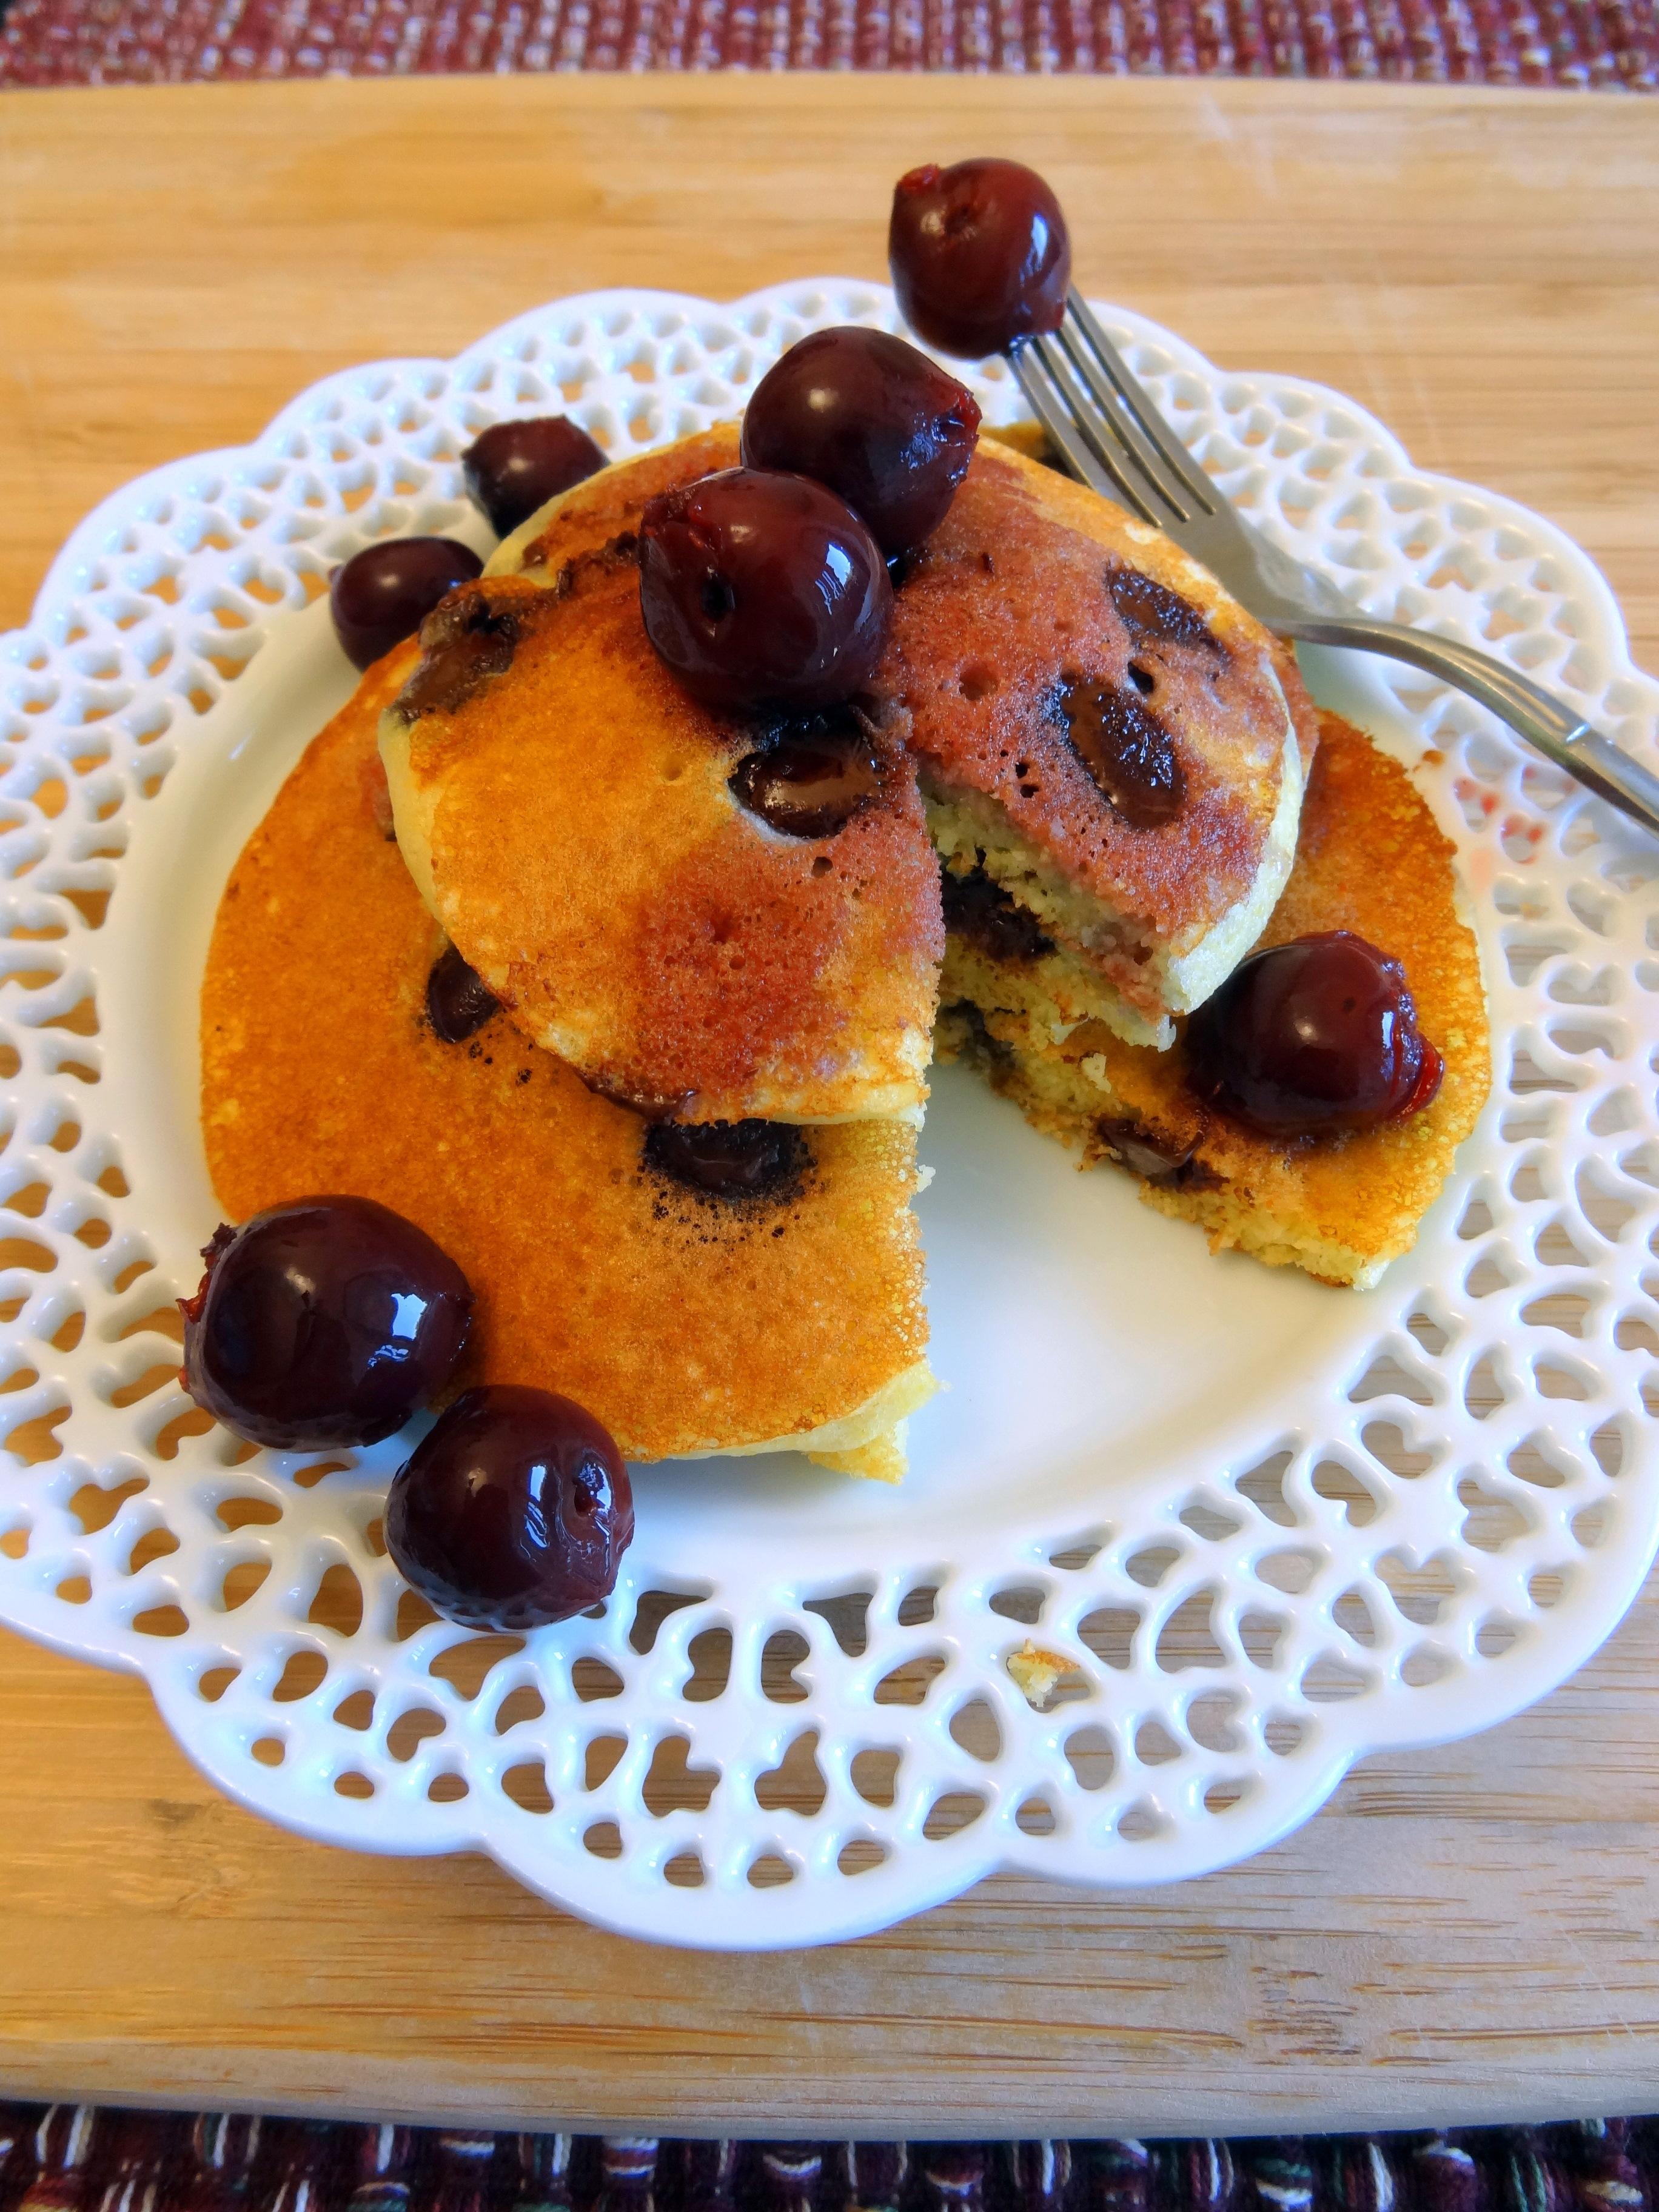 cornmeal chocolate chip pancakes with brandied cherries